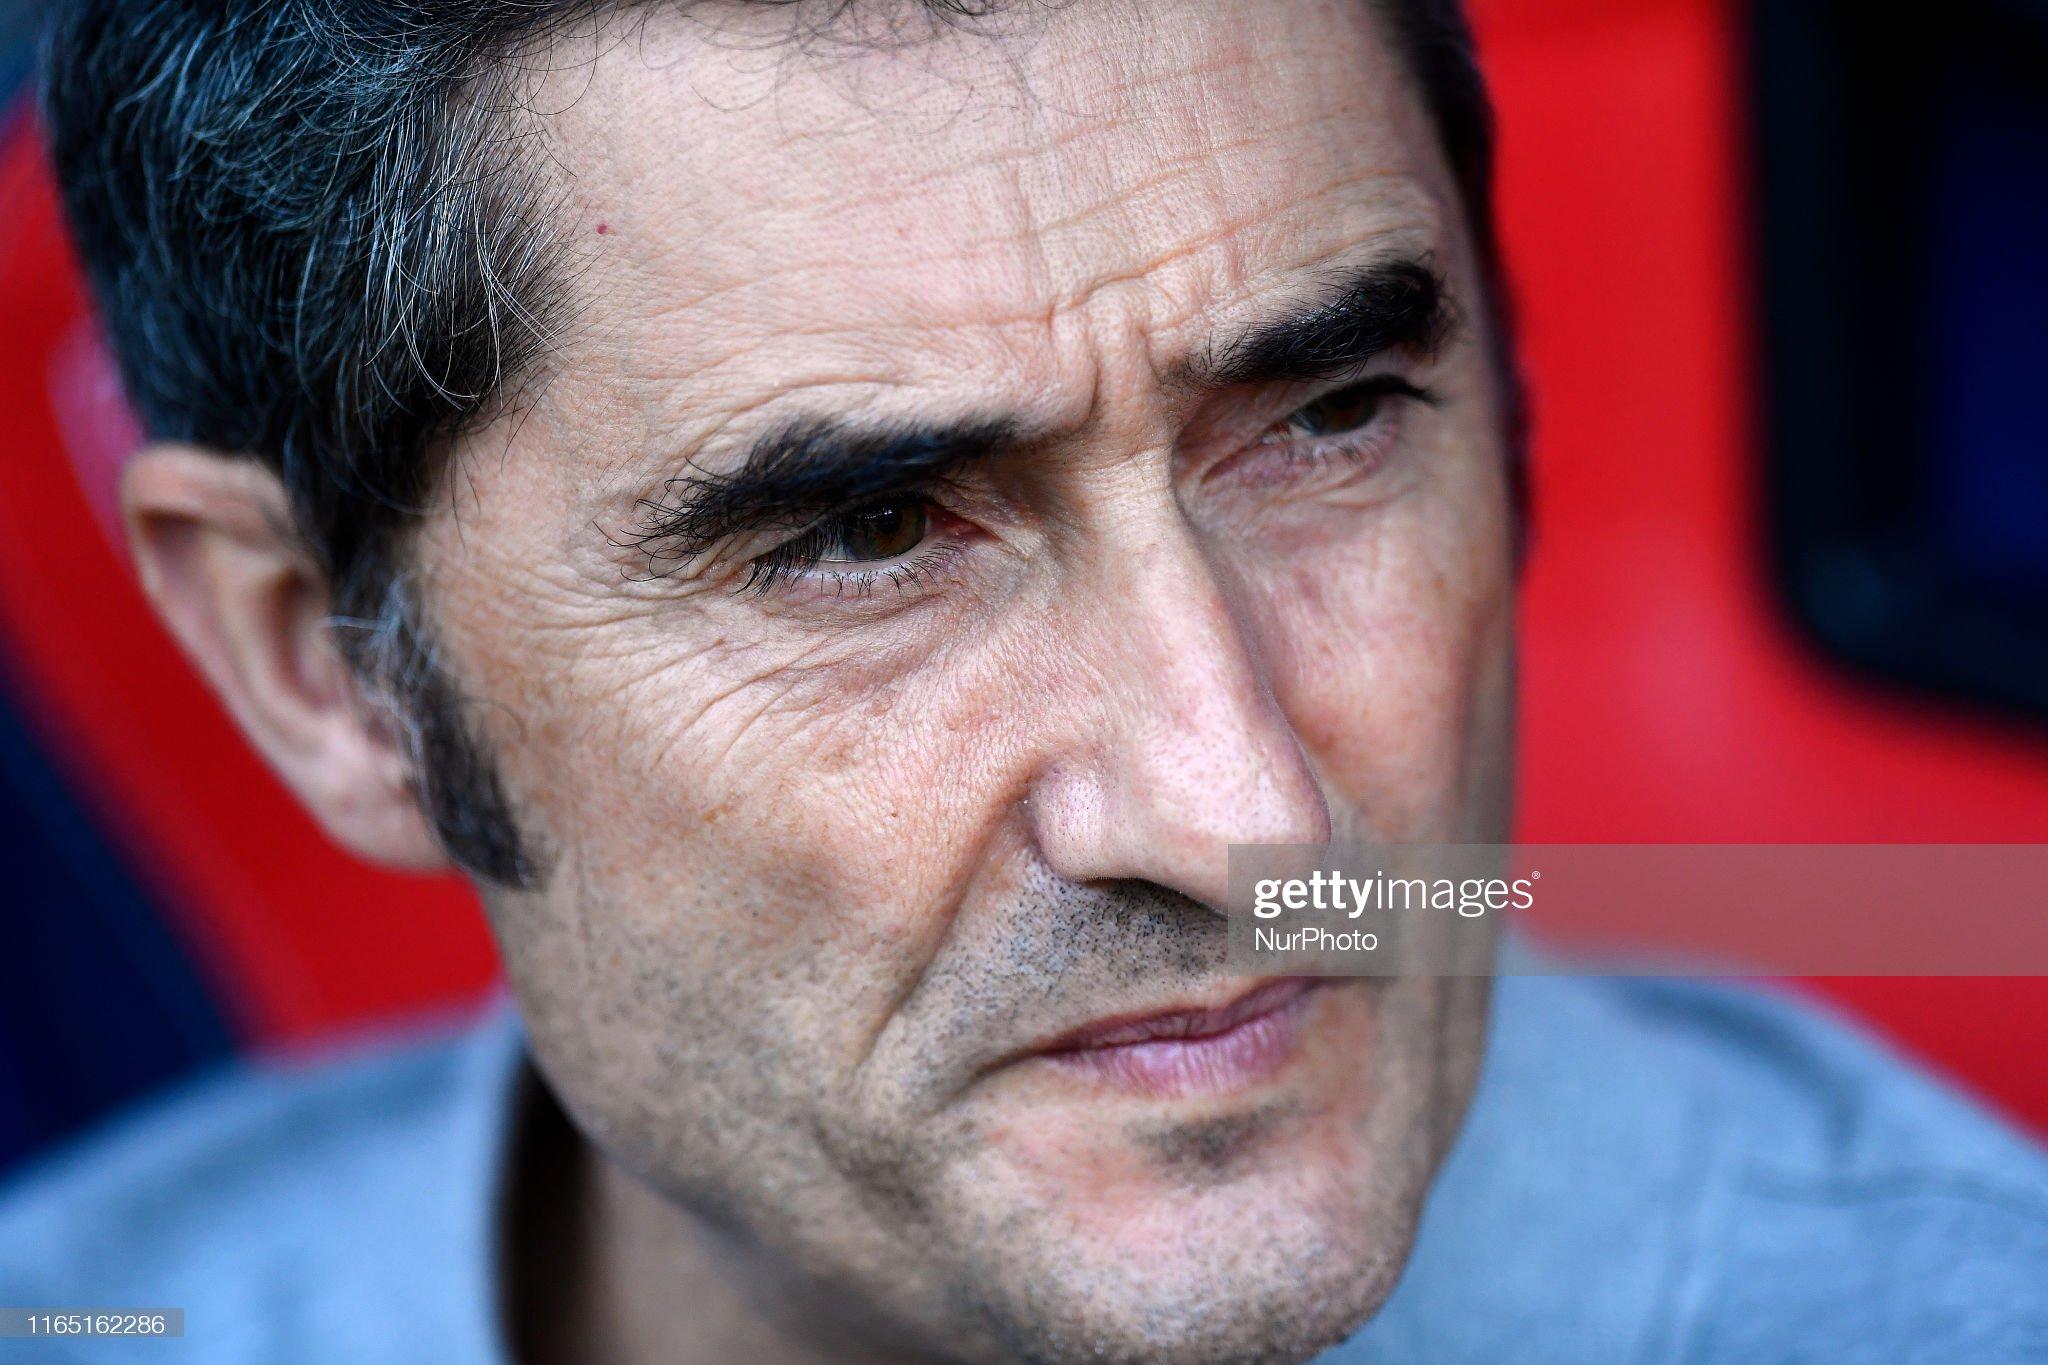 صور مباراة : أوساسونا - برشلونة 2-2 ( 31-08-2019 )  Ernestro-valverde-head-coach-of-barcelona-sitting-on-the-bench-during-picture-id1165162286?s=2048x2048